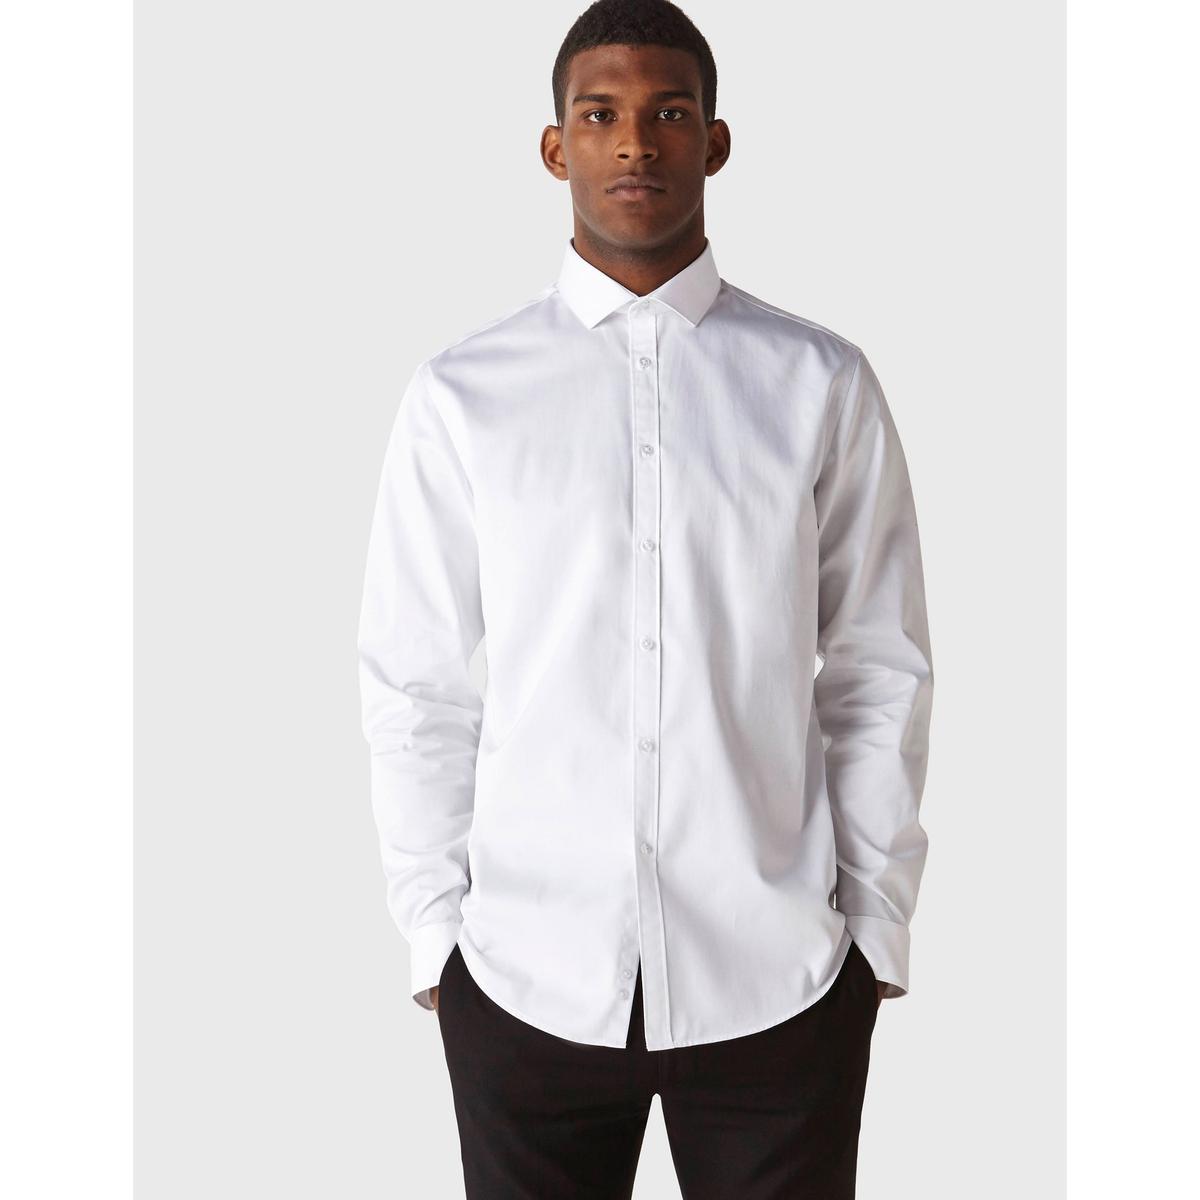 Рубашка прямого покроя SHARANI из хлопкового сатина